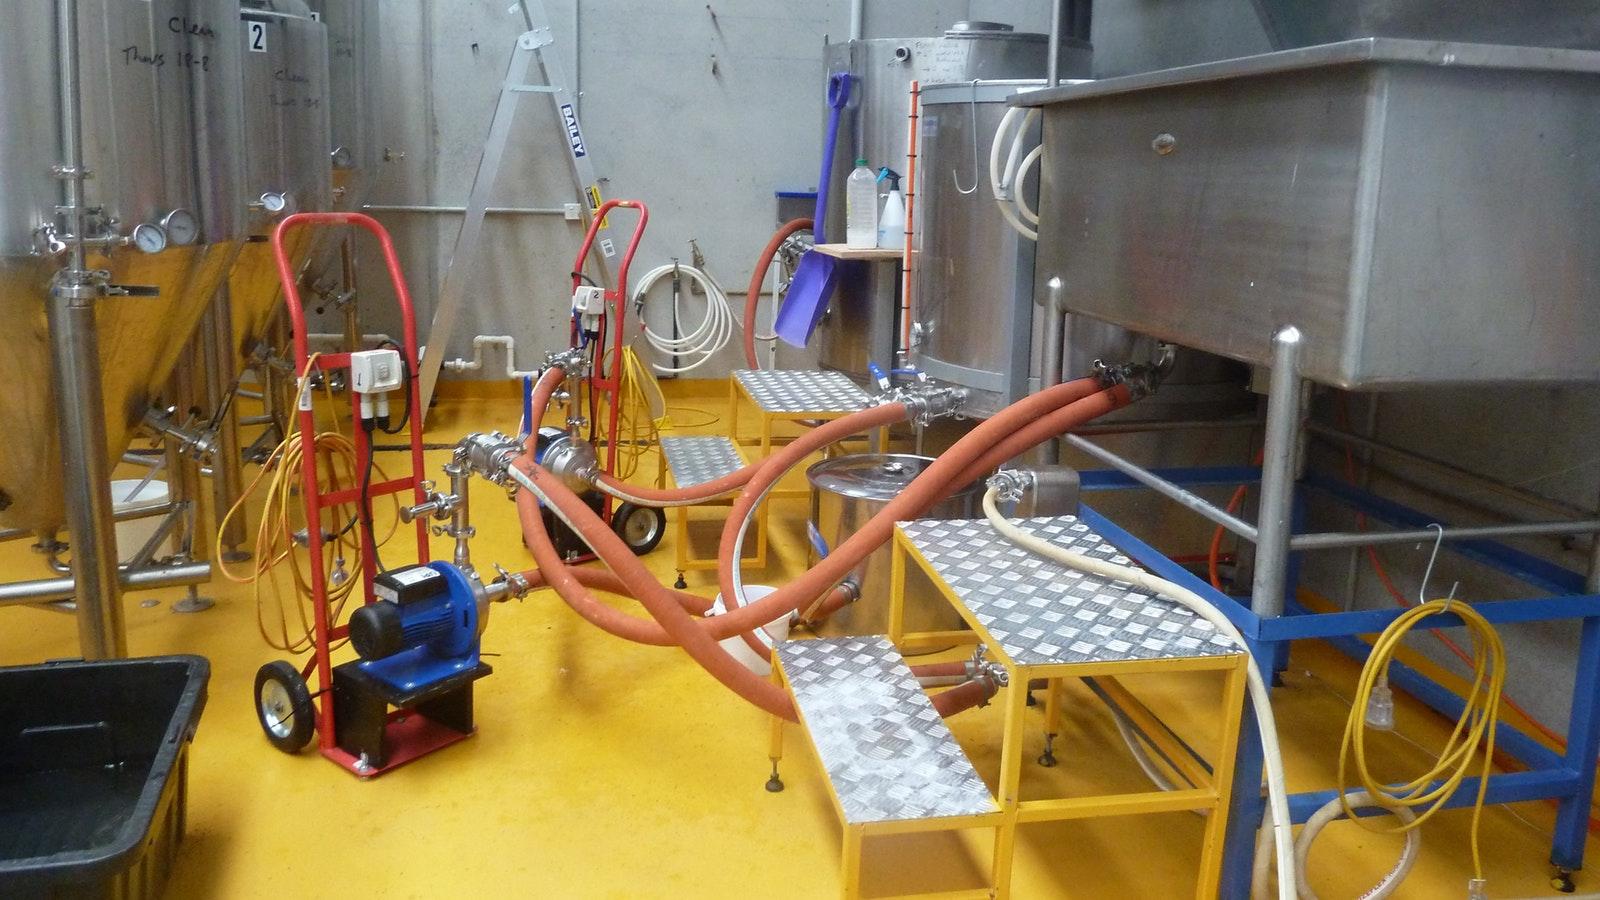 Brew house equipment